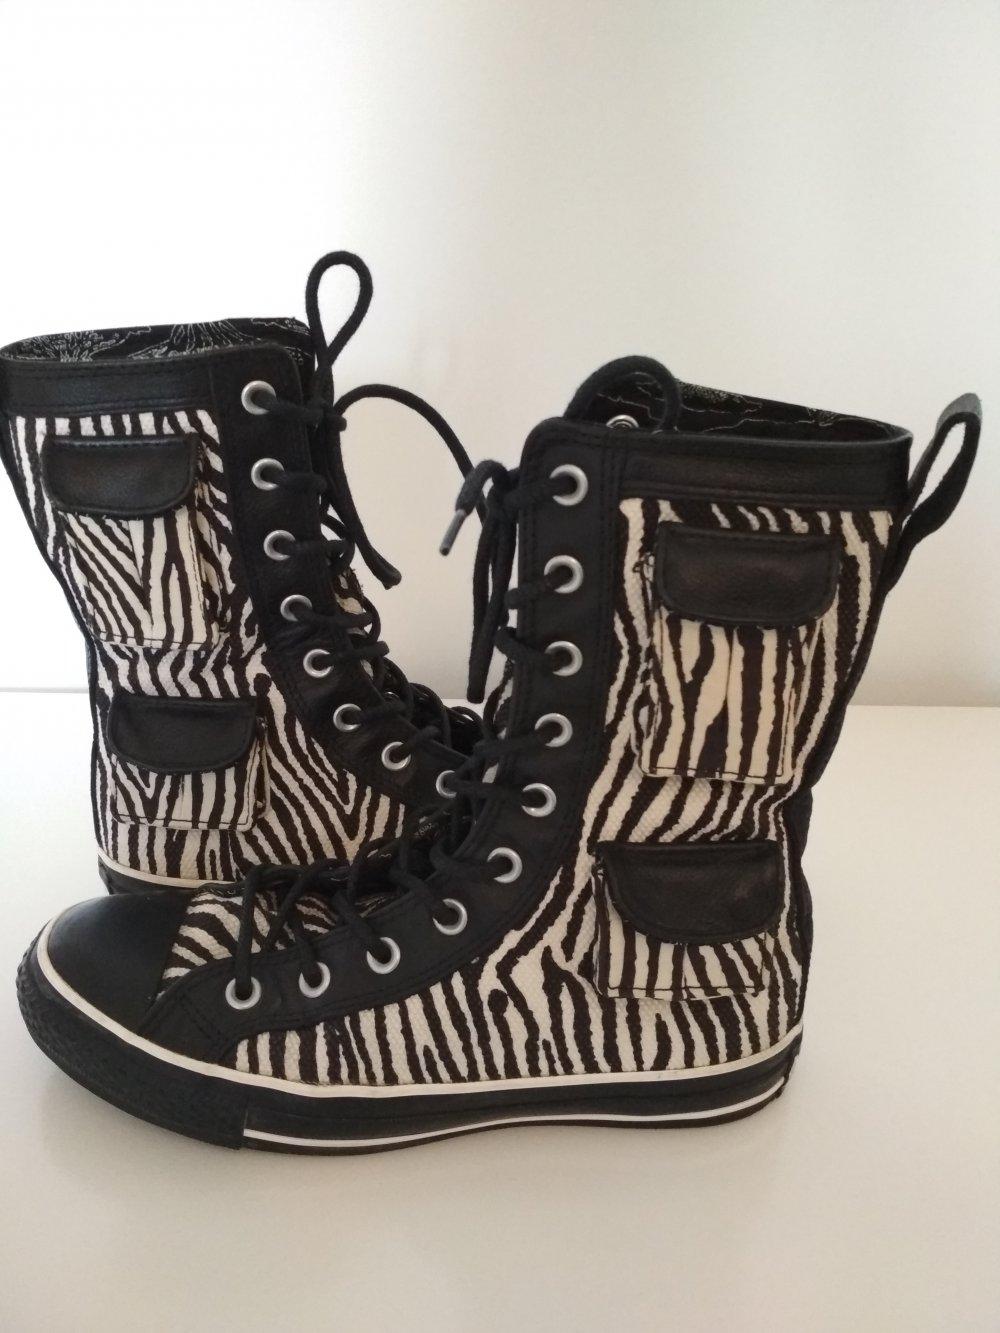 Converse Chucks Xhi Gr. 38 Limited Edition schwarz cremeweiß Zebra Stiefel